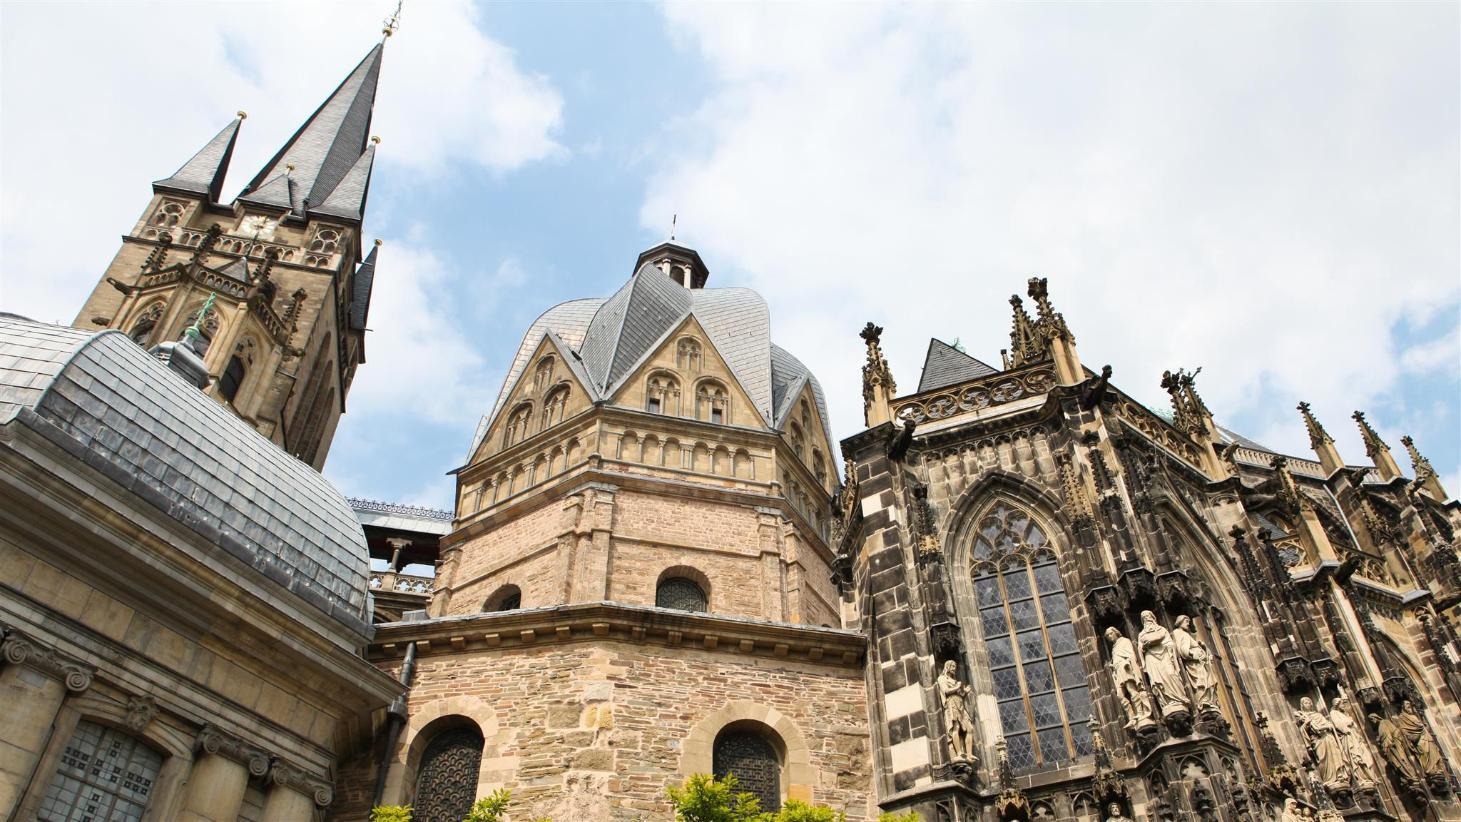 10 Best Aachen Hotels Hd Photos Reviews Of Hotels In Aachen Germany